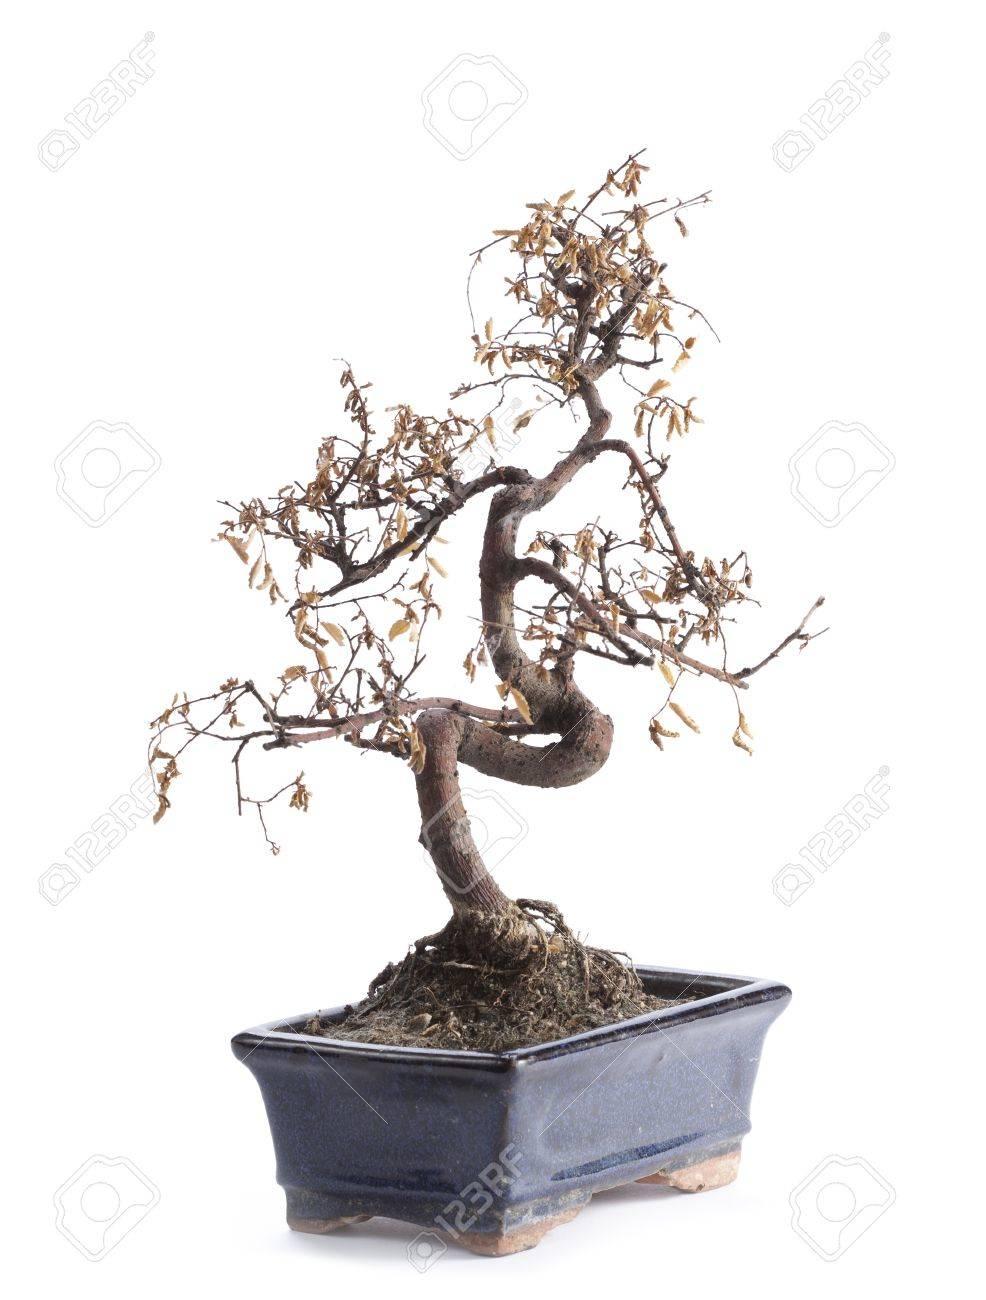 deceased bonsai tree - 11646240